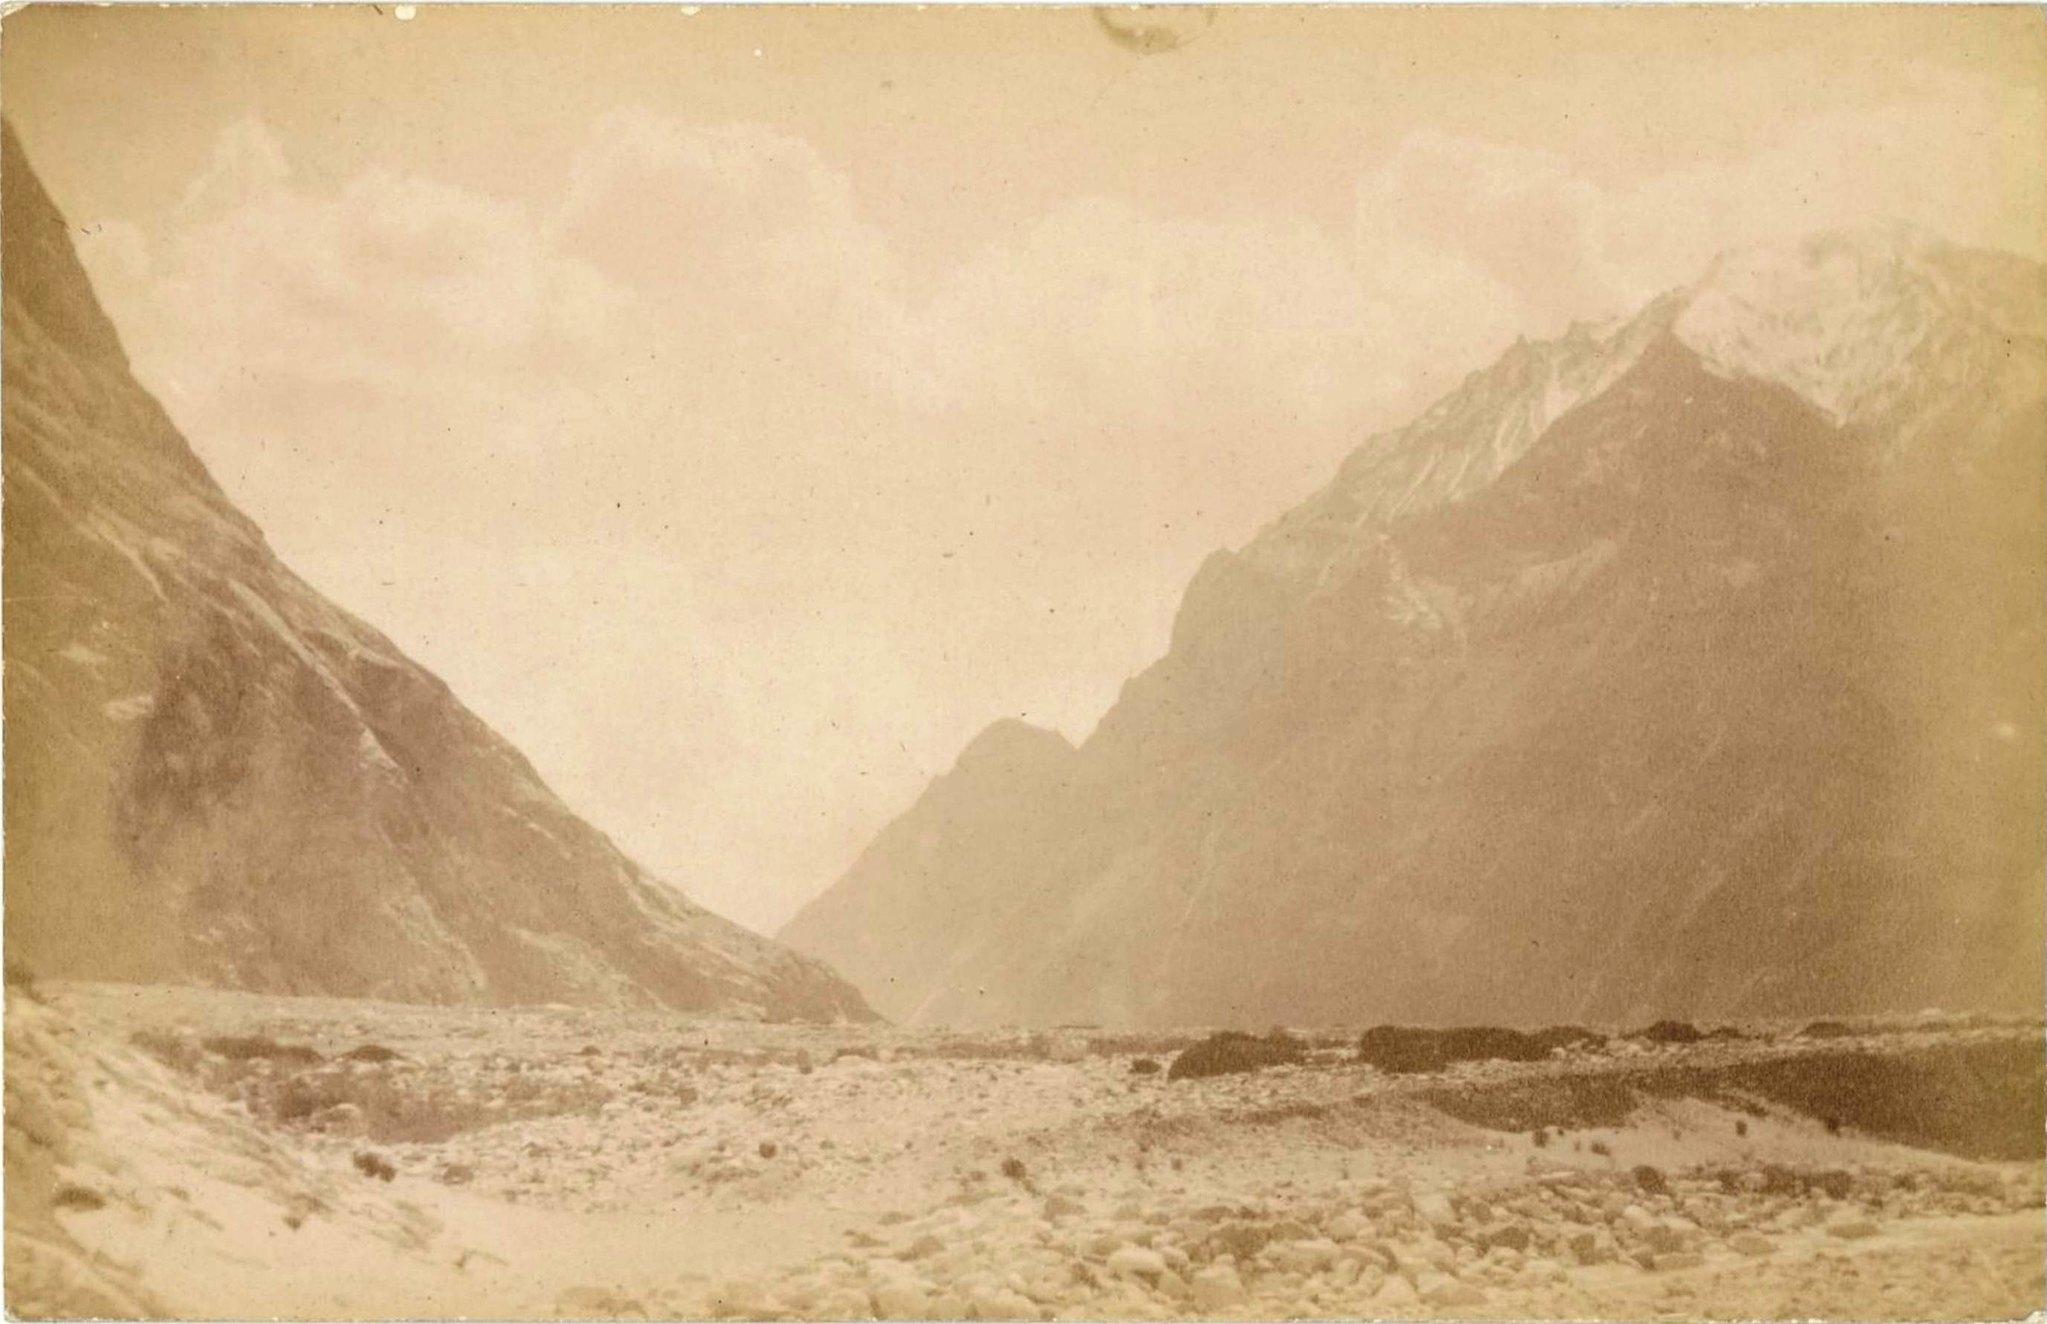 10. Ледники гор Хан-Тенгри. Ледник Западный Моцарт